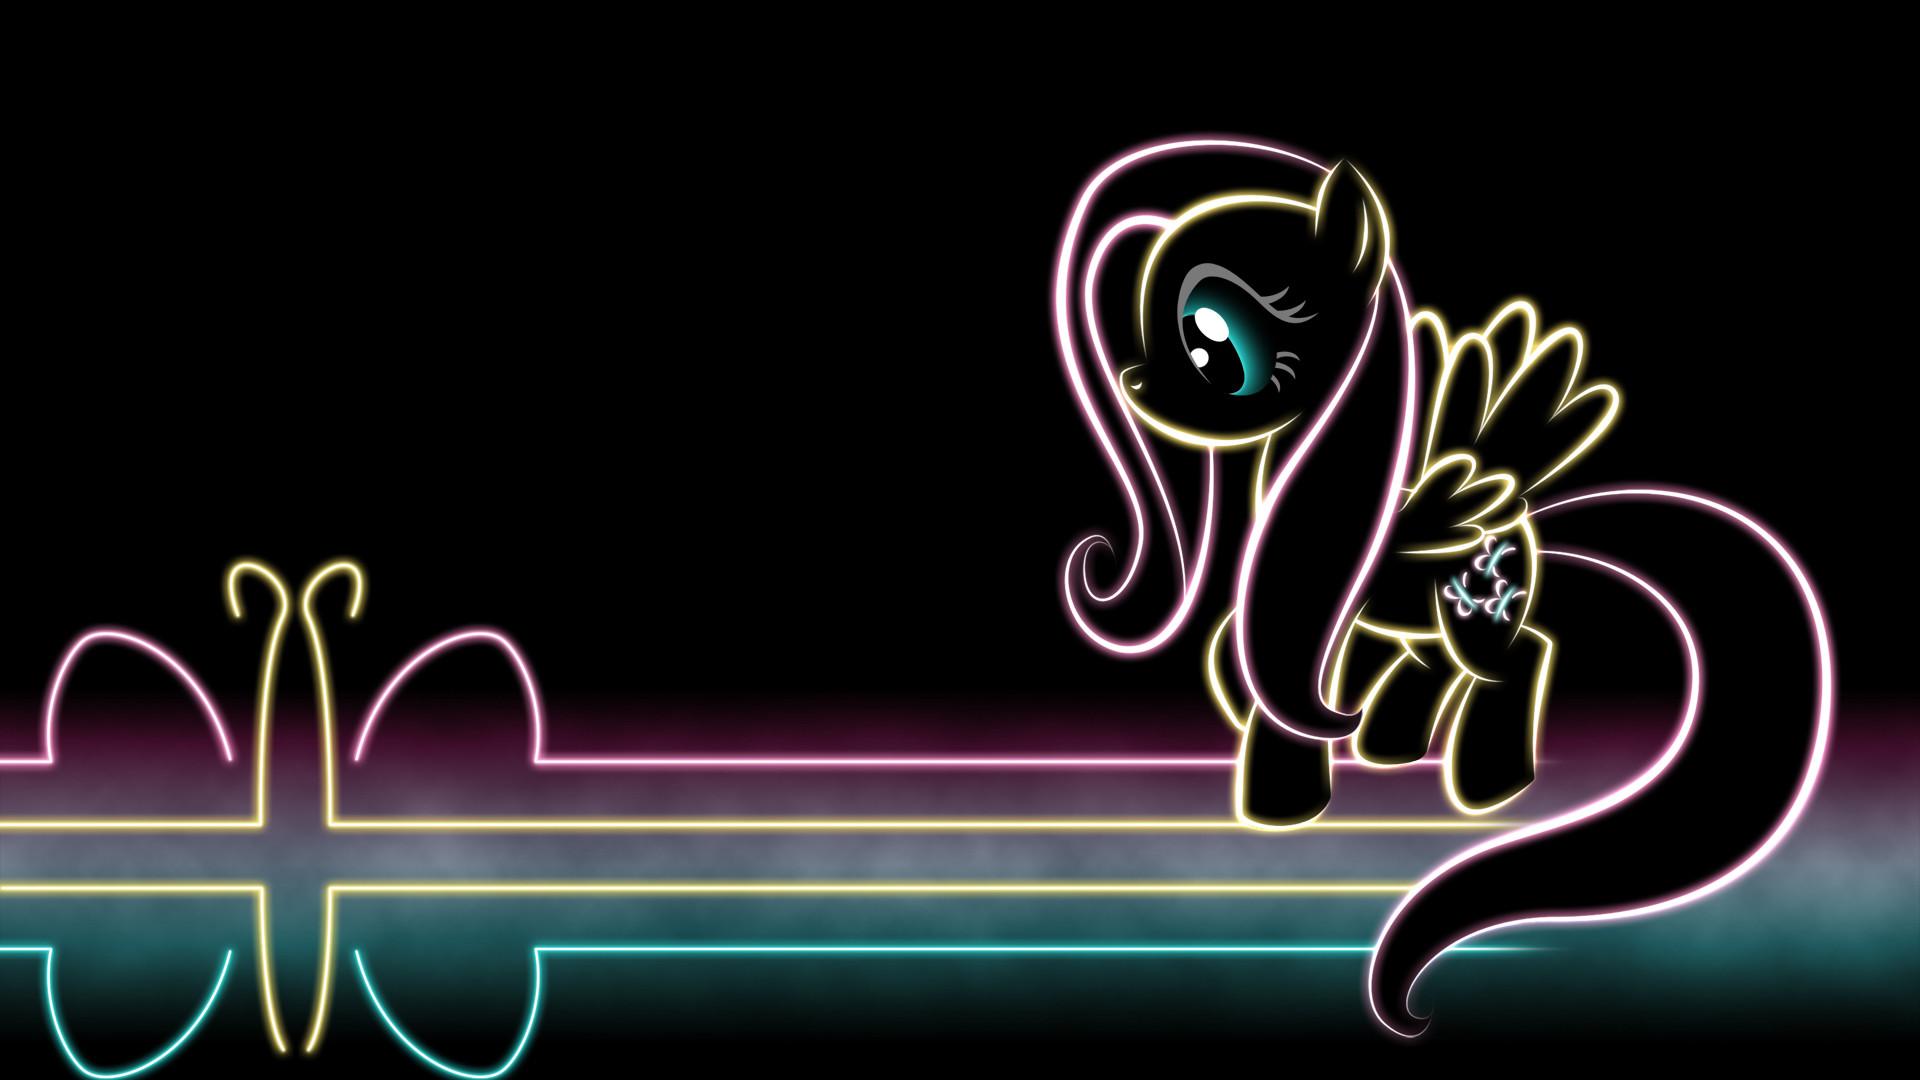 my little pony wallpaper 5418